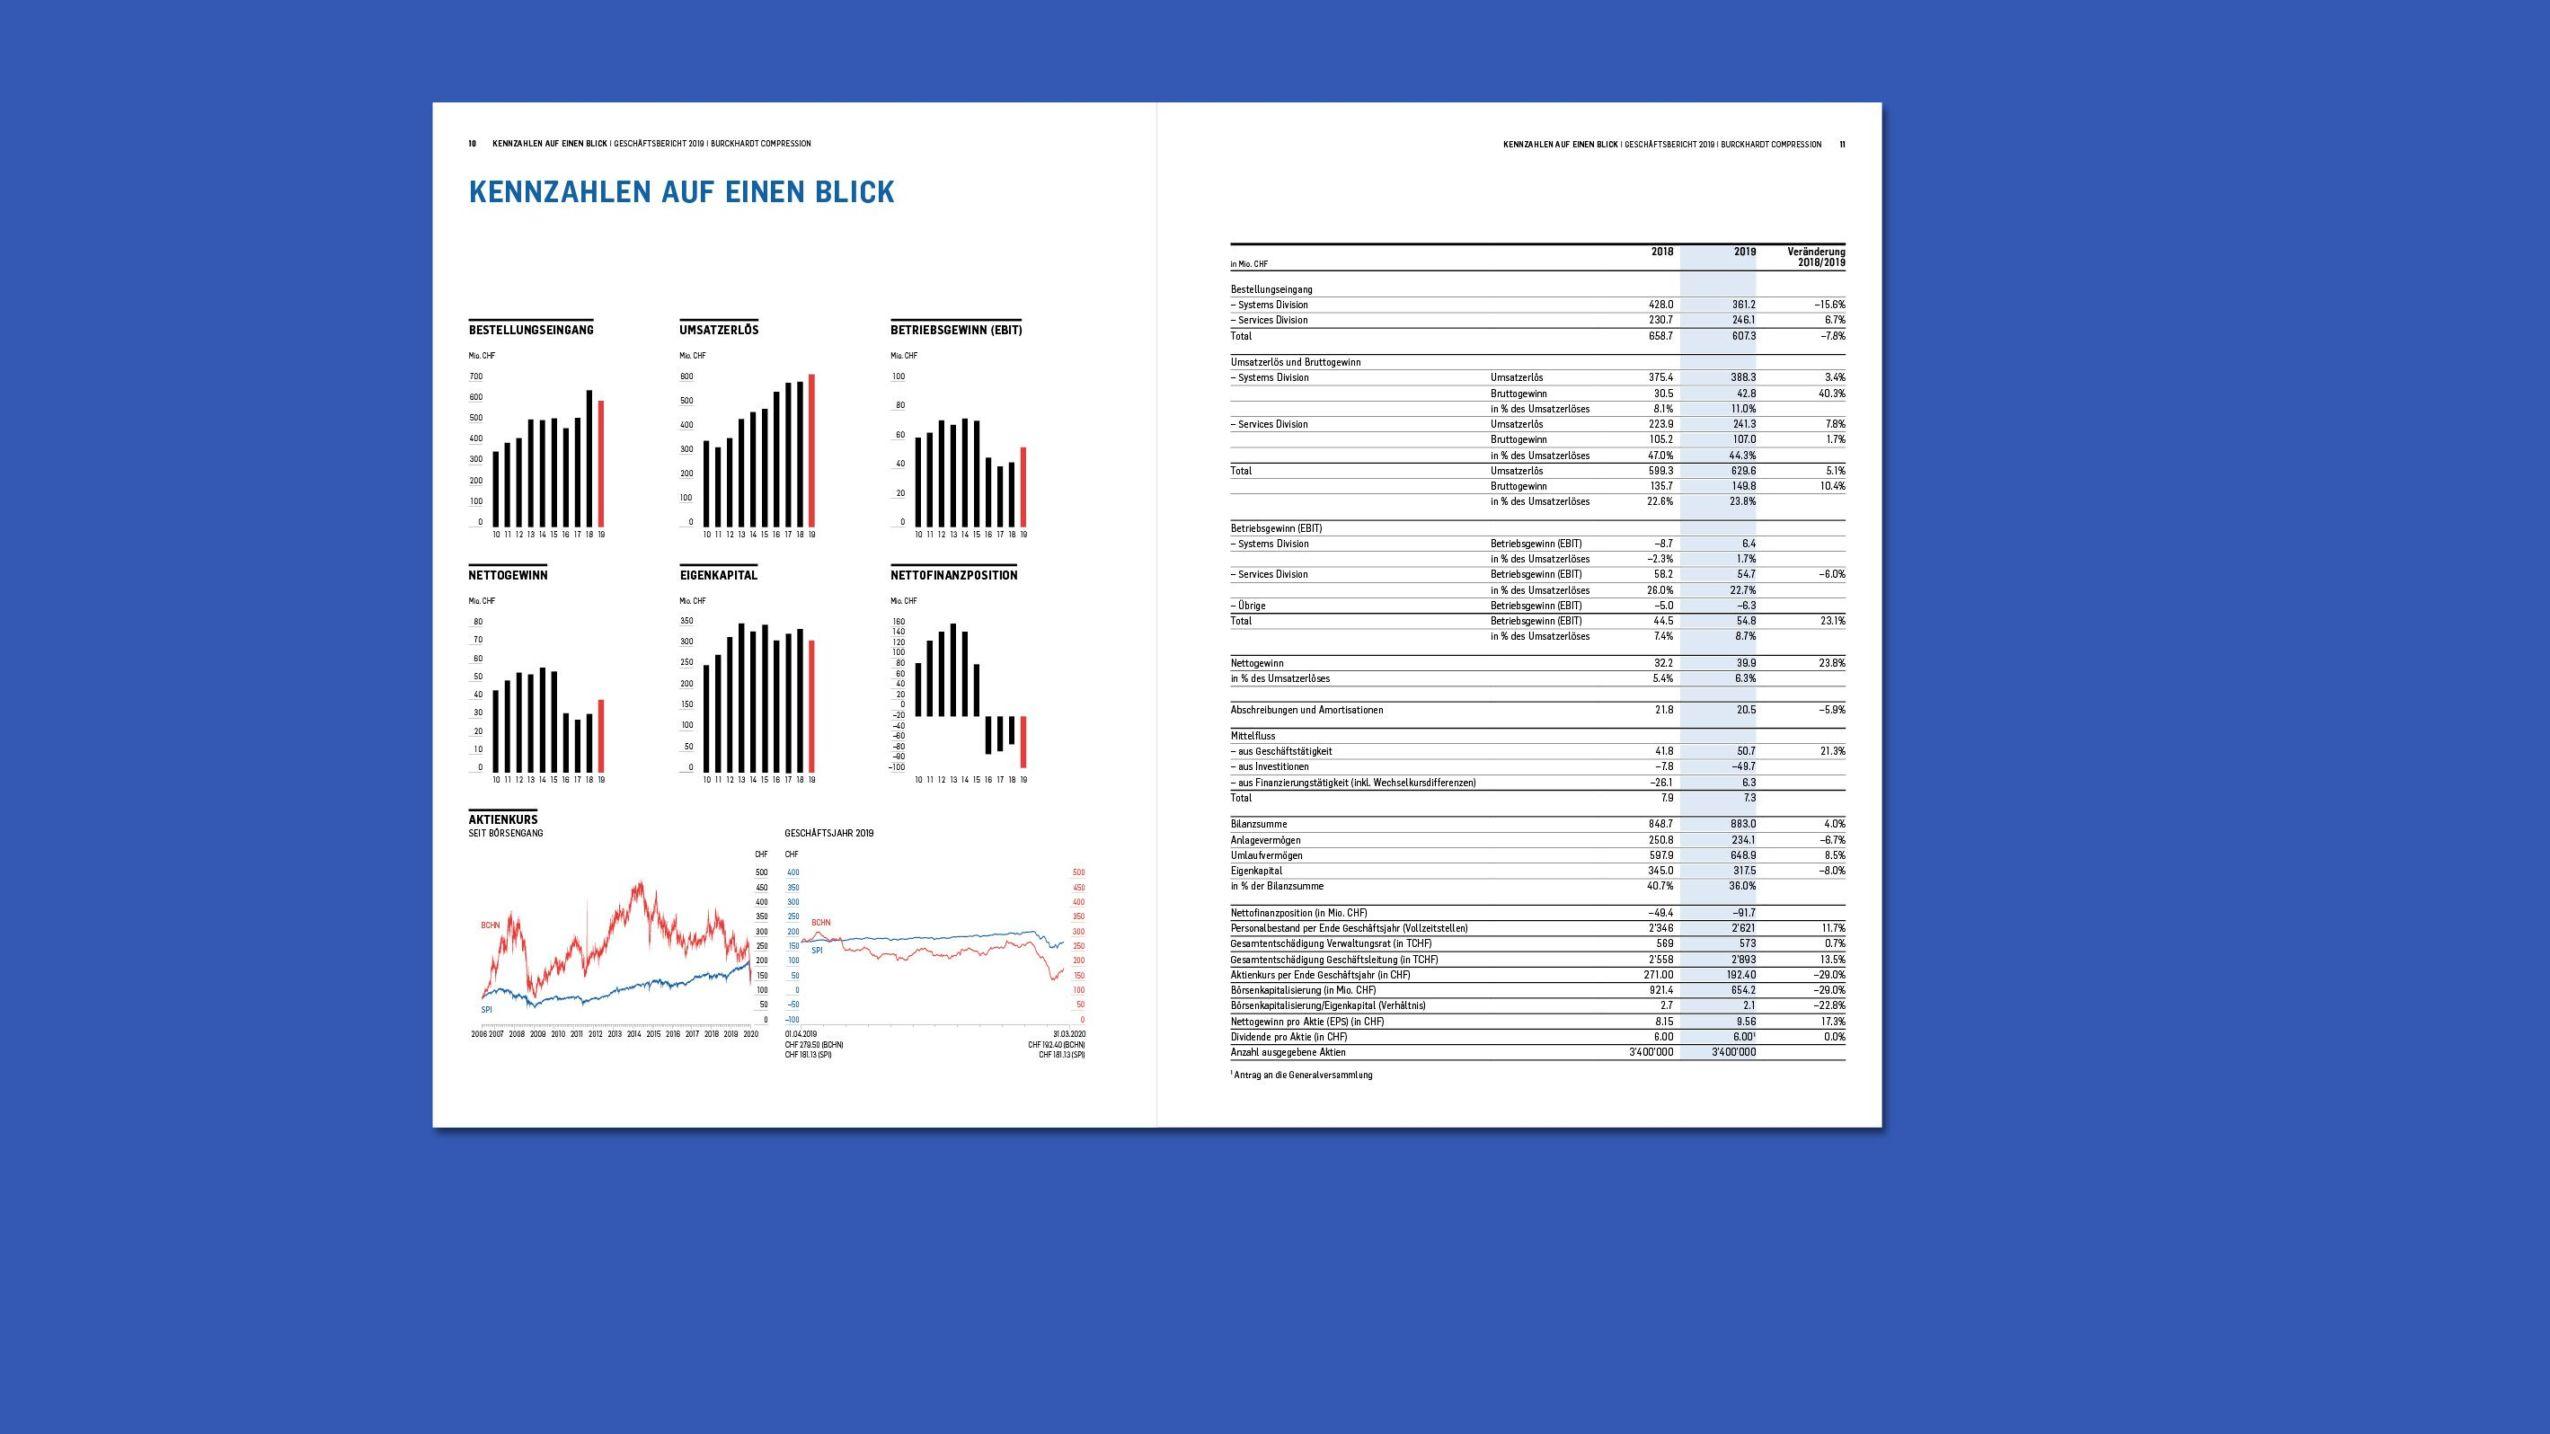 Geschäftsberichterstattung Burckhardt Compression 2019. Print-Ausgabe